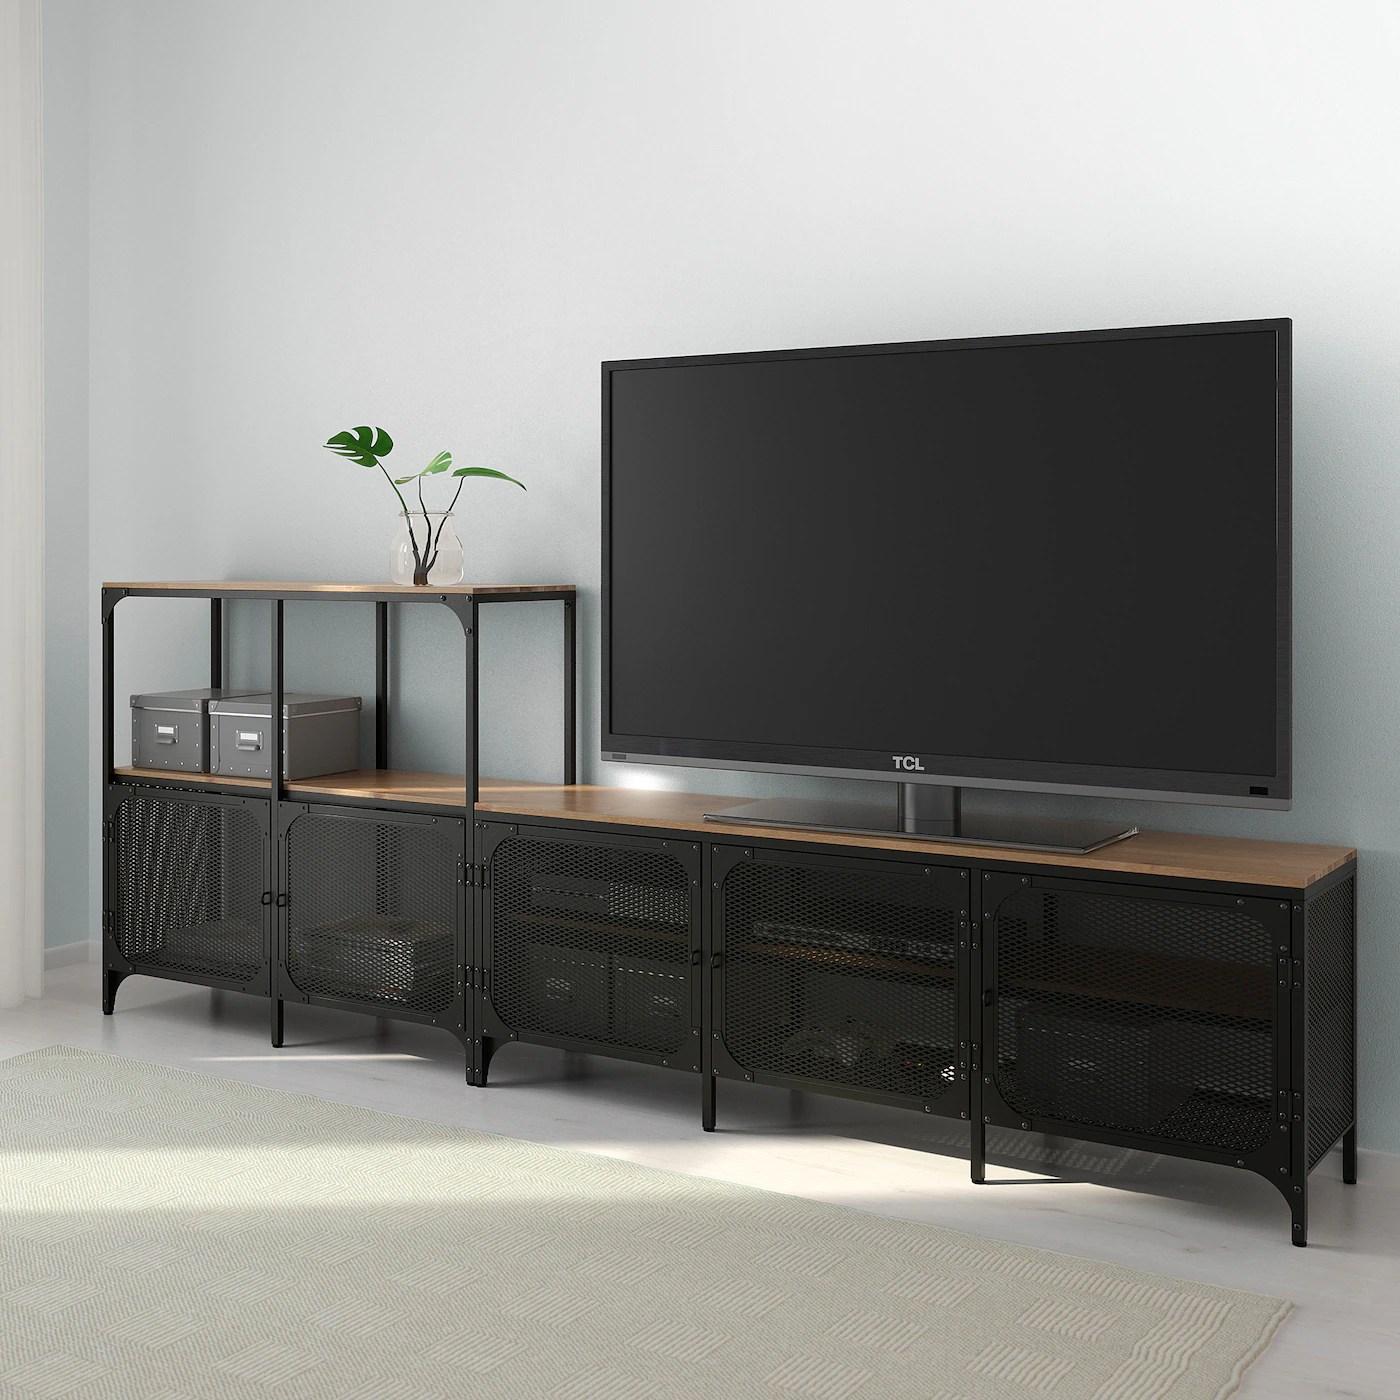 fjallbo combinaison meuble tv noir 250x36x95 cm